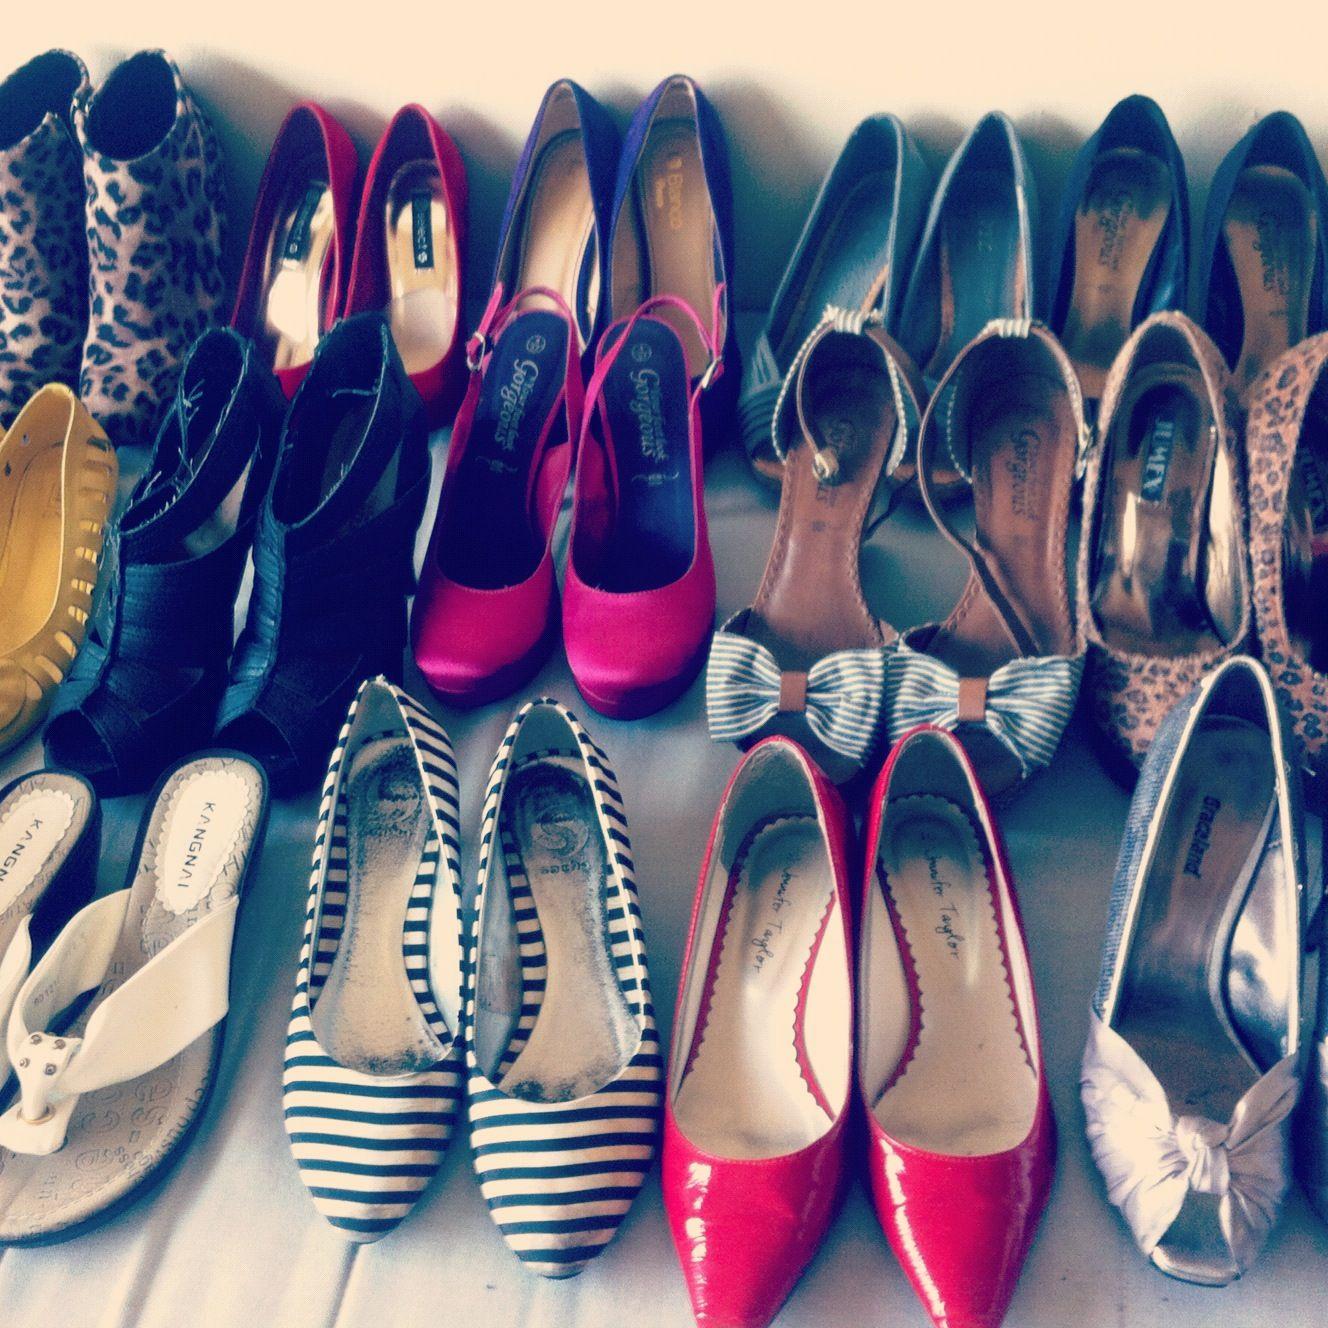 Shoes shoes n shoes !